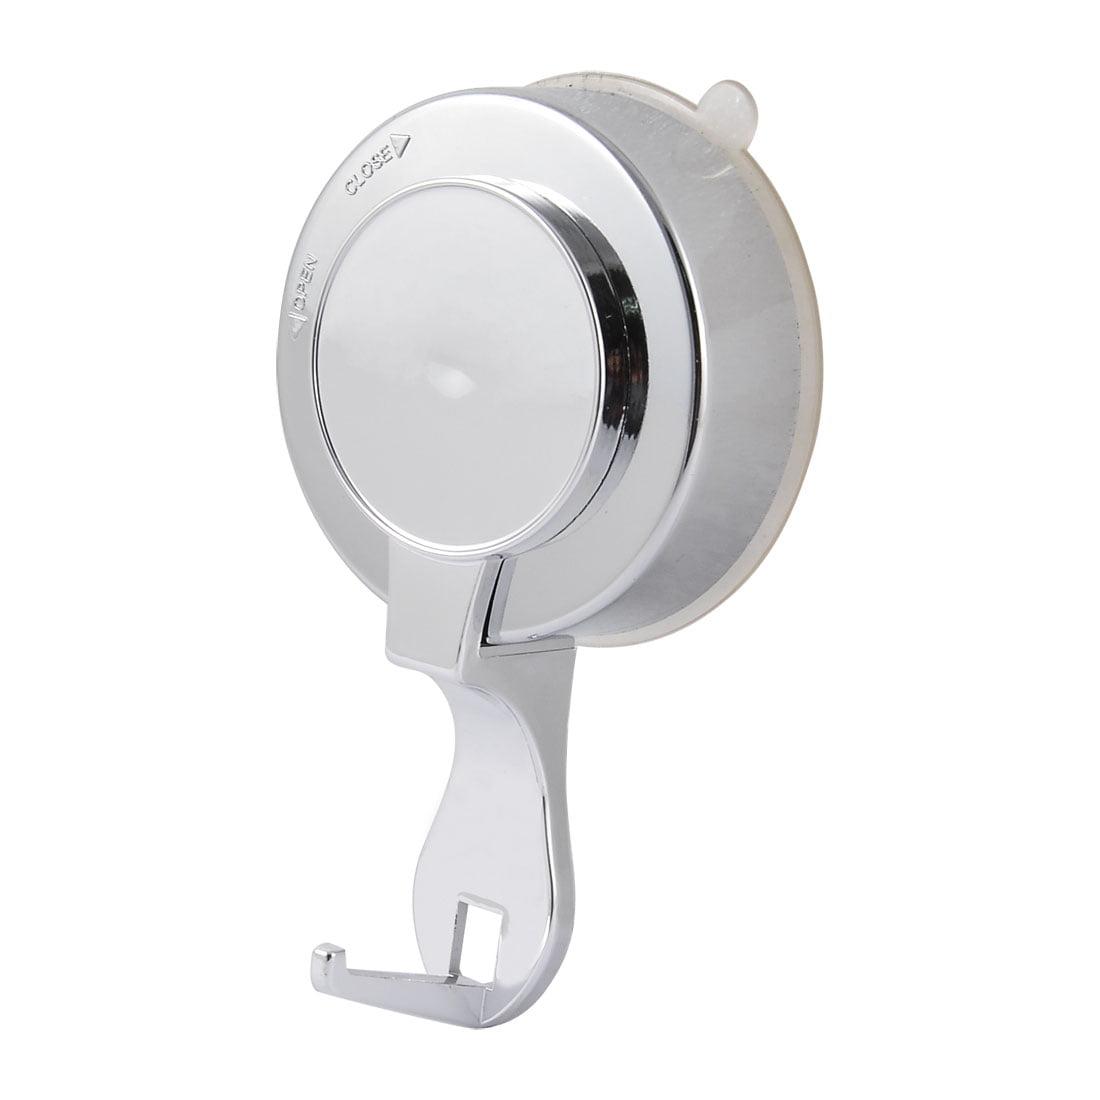 Unique Bargains Kitchen Household Plastic Lock Strong Suction Cup Single Hook Holder Hanger - image 3 of 3